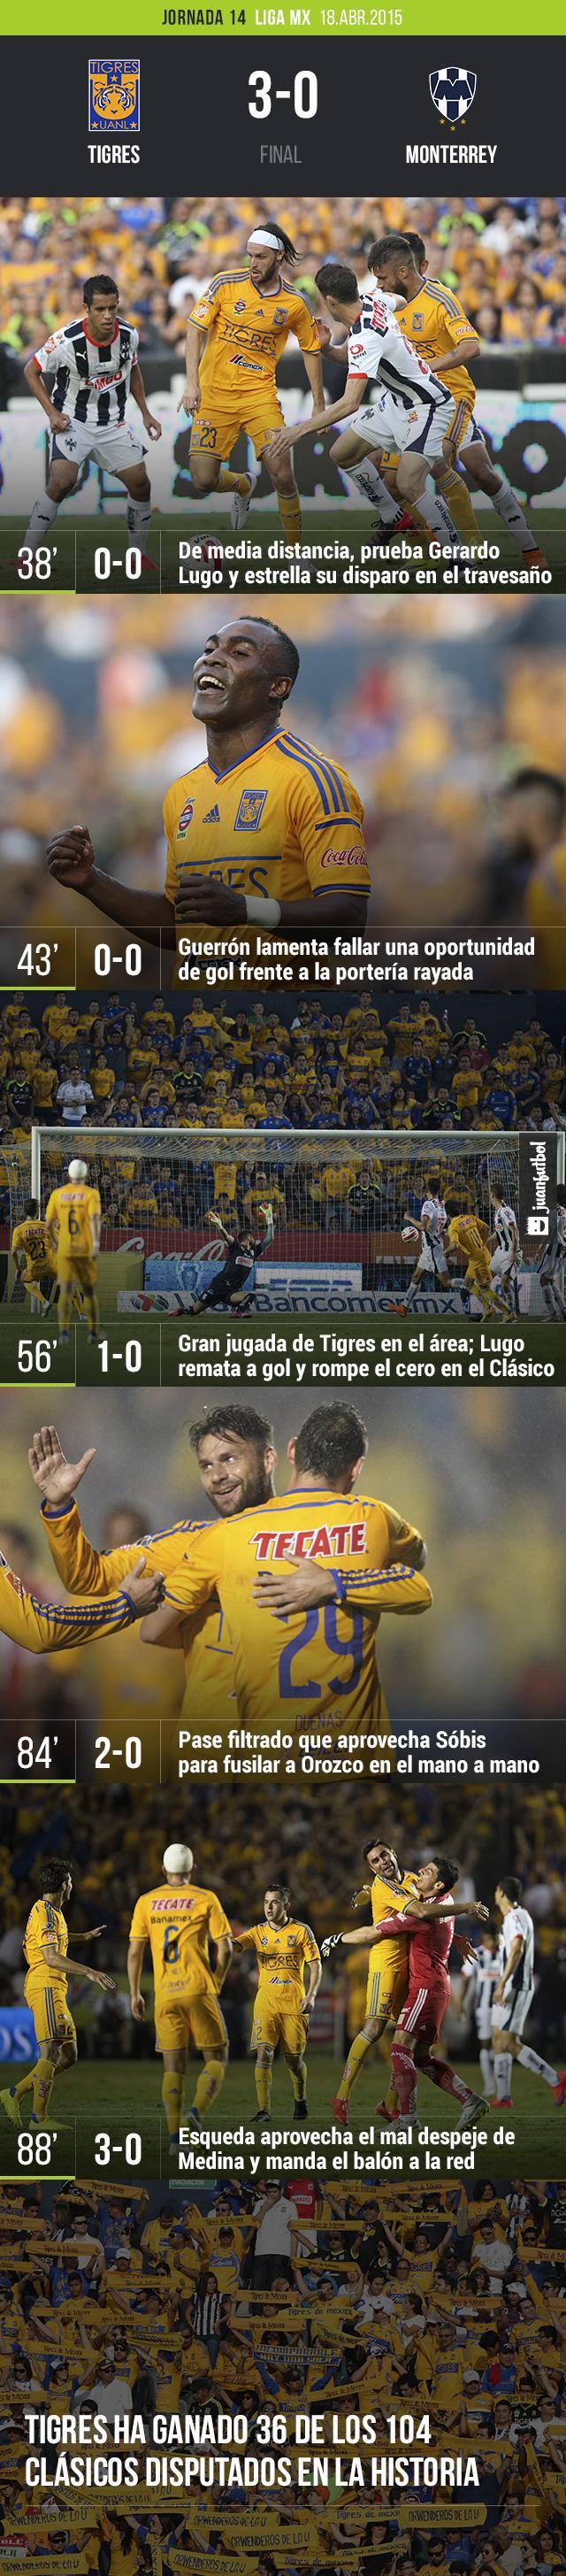 Tigres 3-0 Monterrey